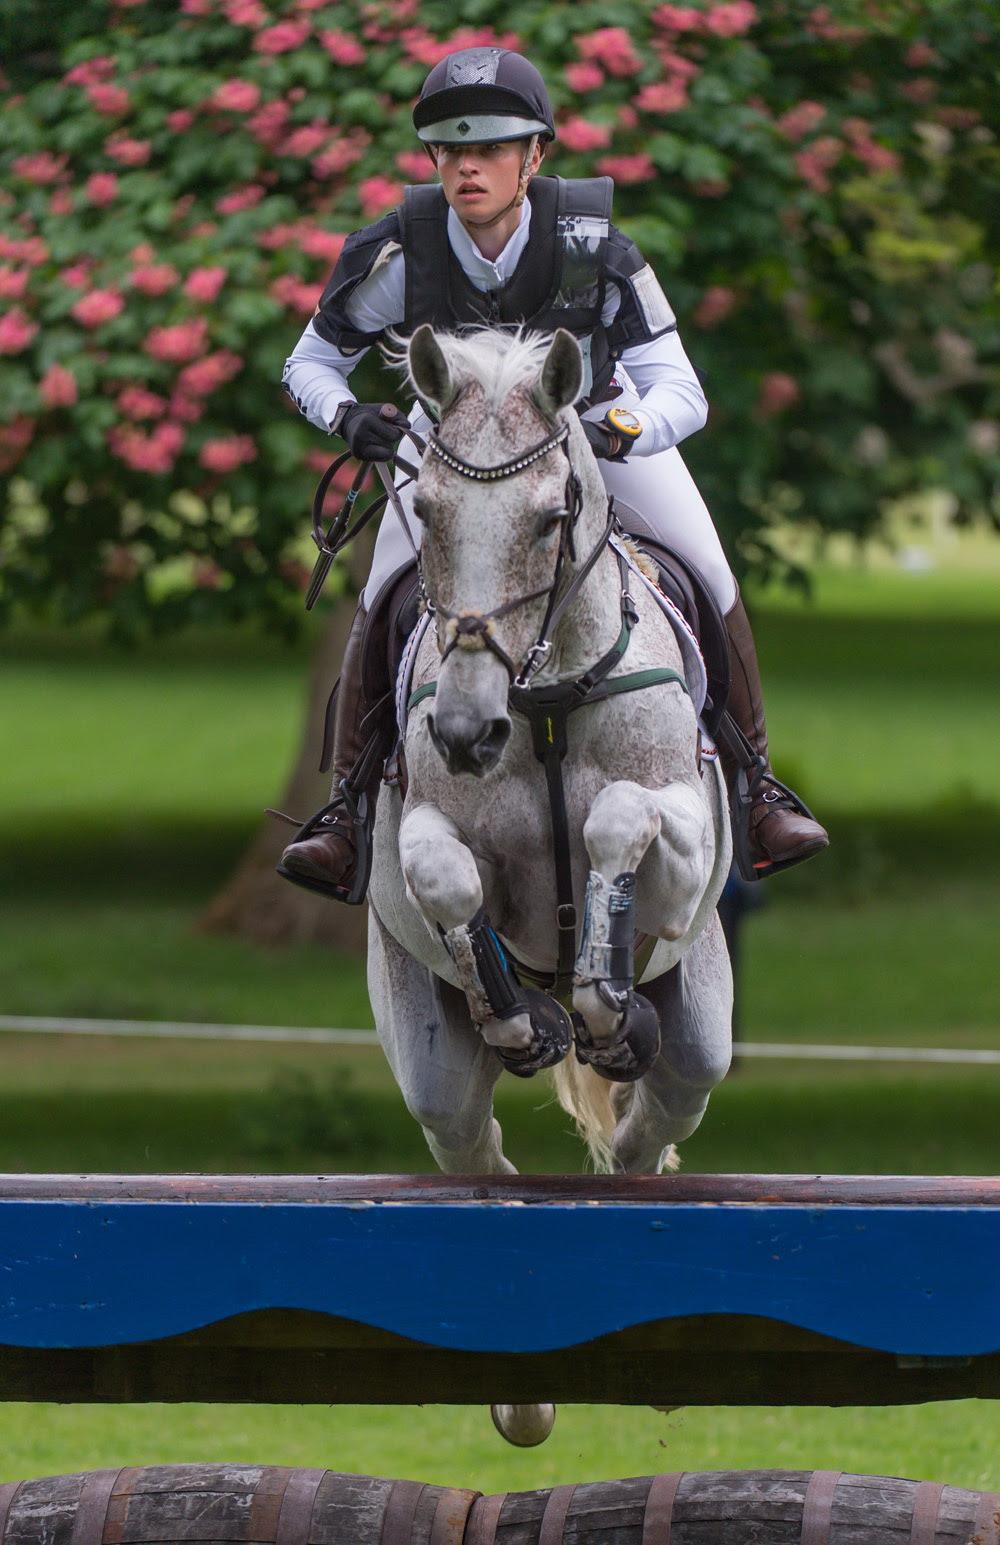 Josephine  Schnaufer (GER) riding  Sambucca 10 CICO  three star competition at the Houghton International Horse Trials 2016 © Trevor Holt